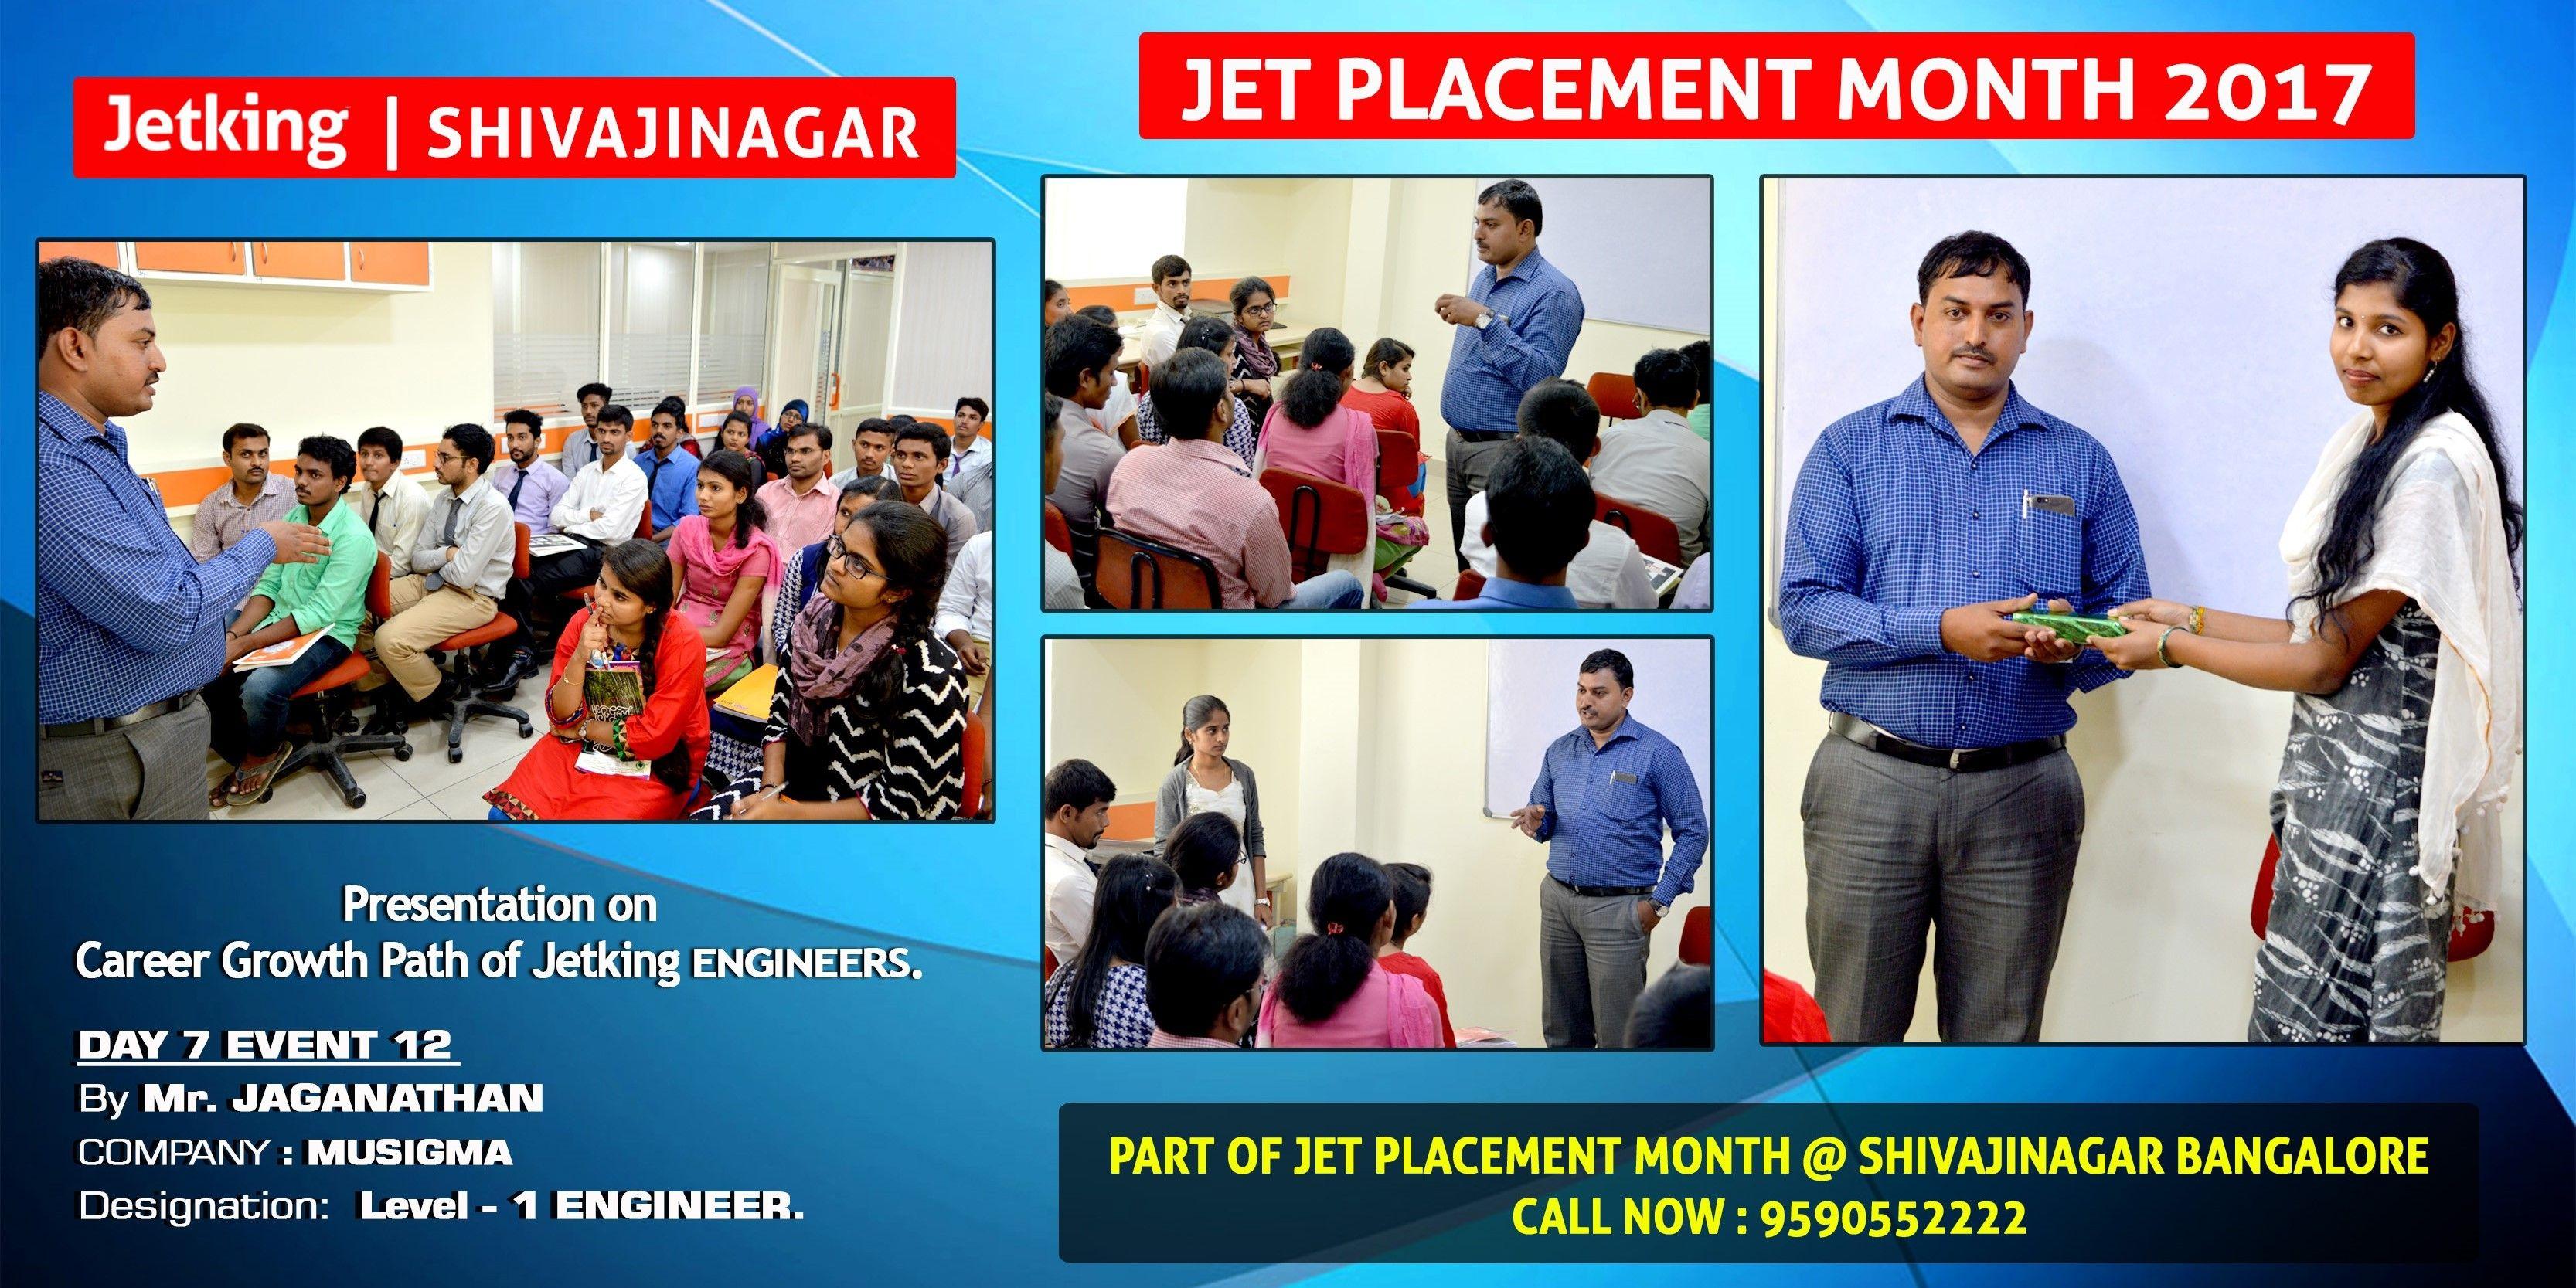 Day 7 event 12 presentation on presentation on career